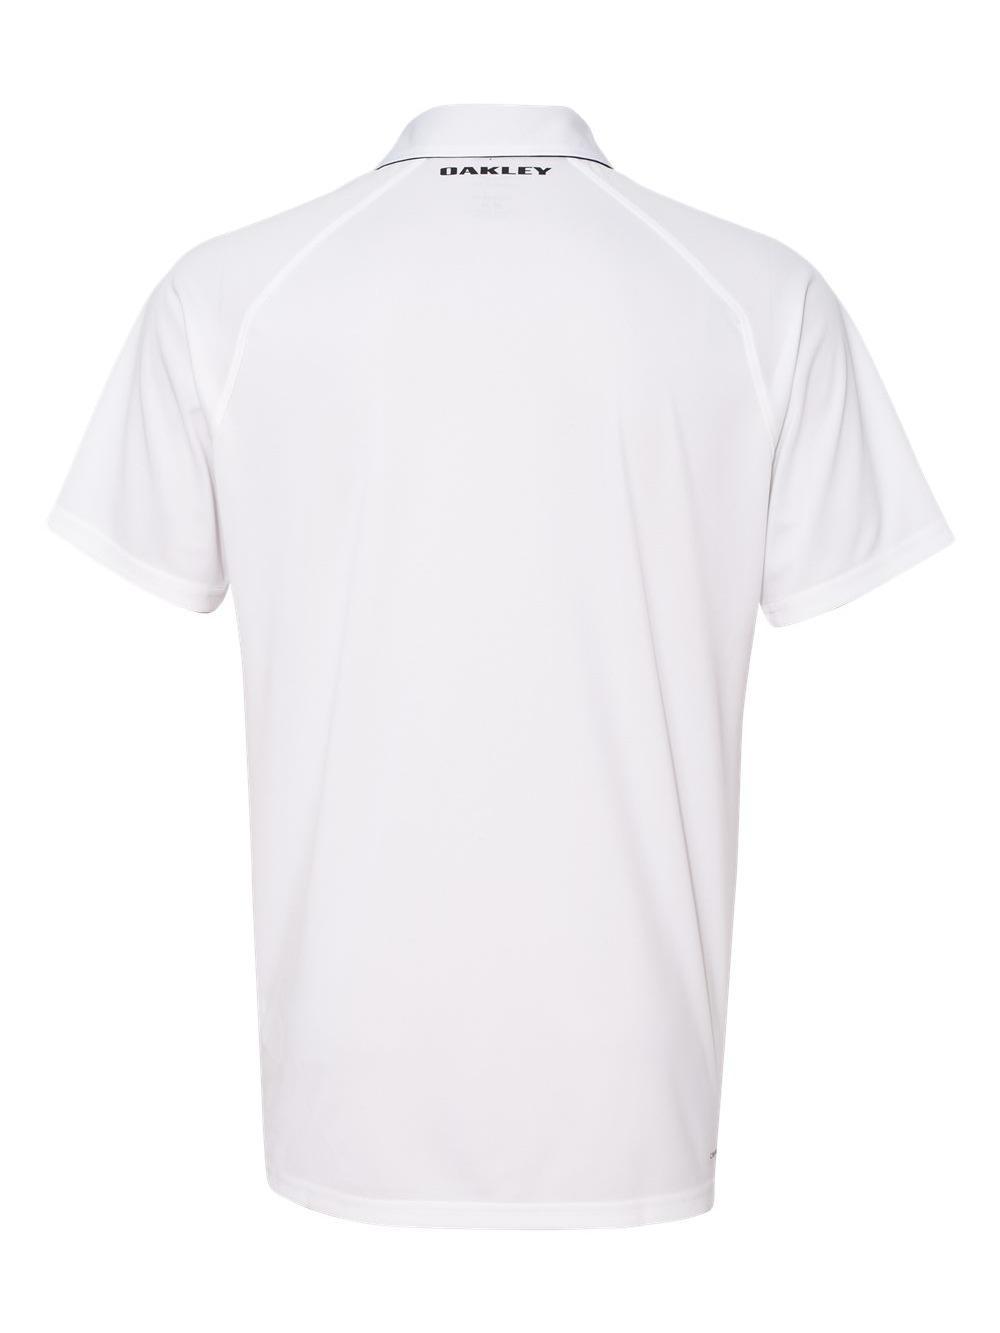 Oakley-Elemental-2-0-Sport-Shirt-432632ODM thumbnail 13